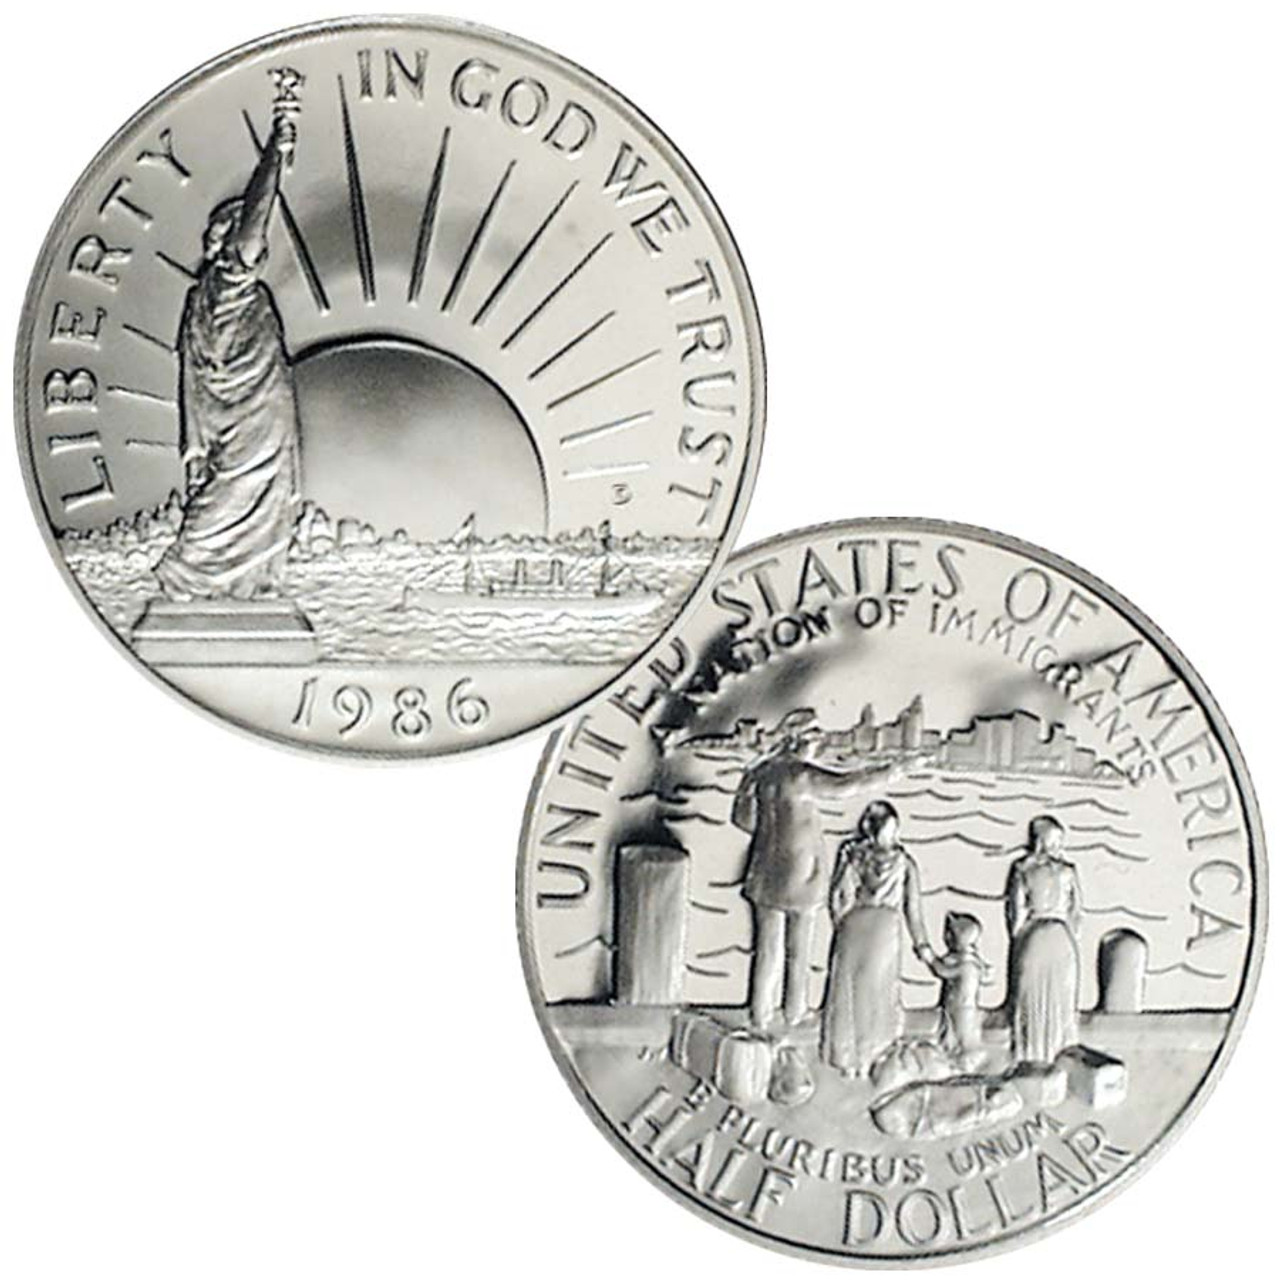 1986-D Statue of Liberty Half Dollar Brilliant Uncirculated Image 1